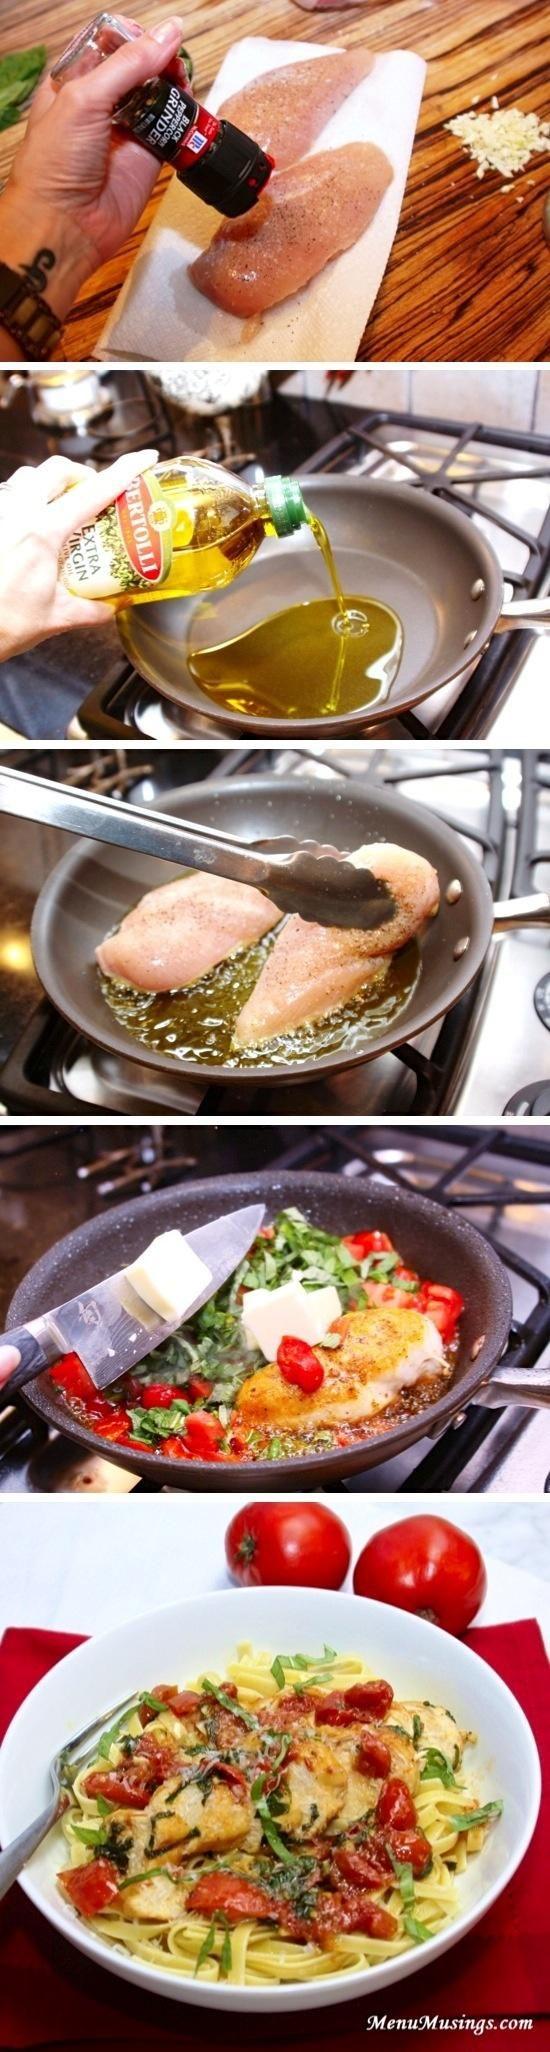 Tomato Basil Chicken | Recipe By Photo